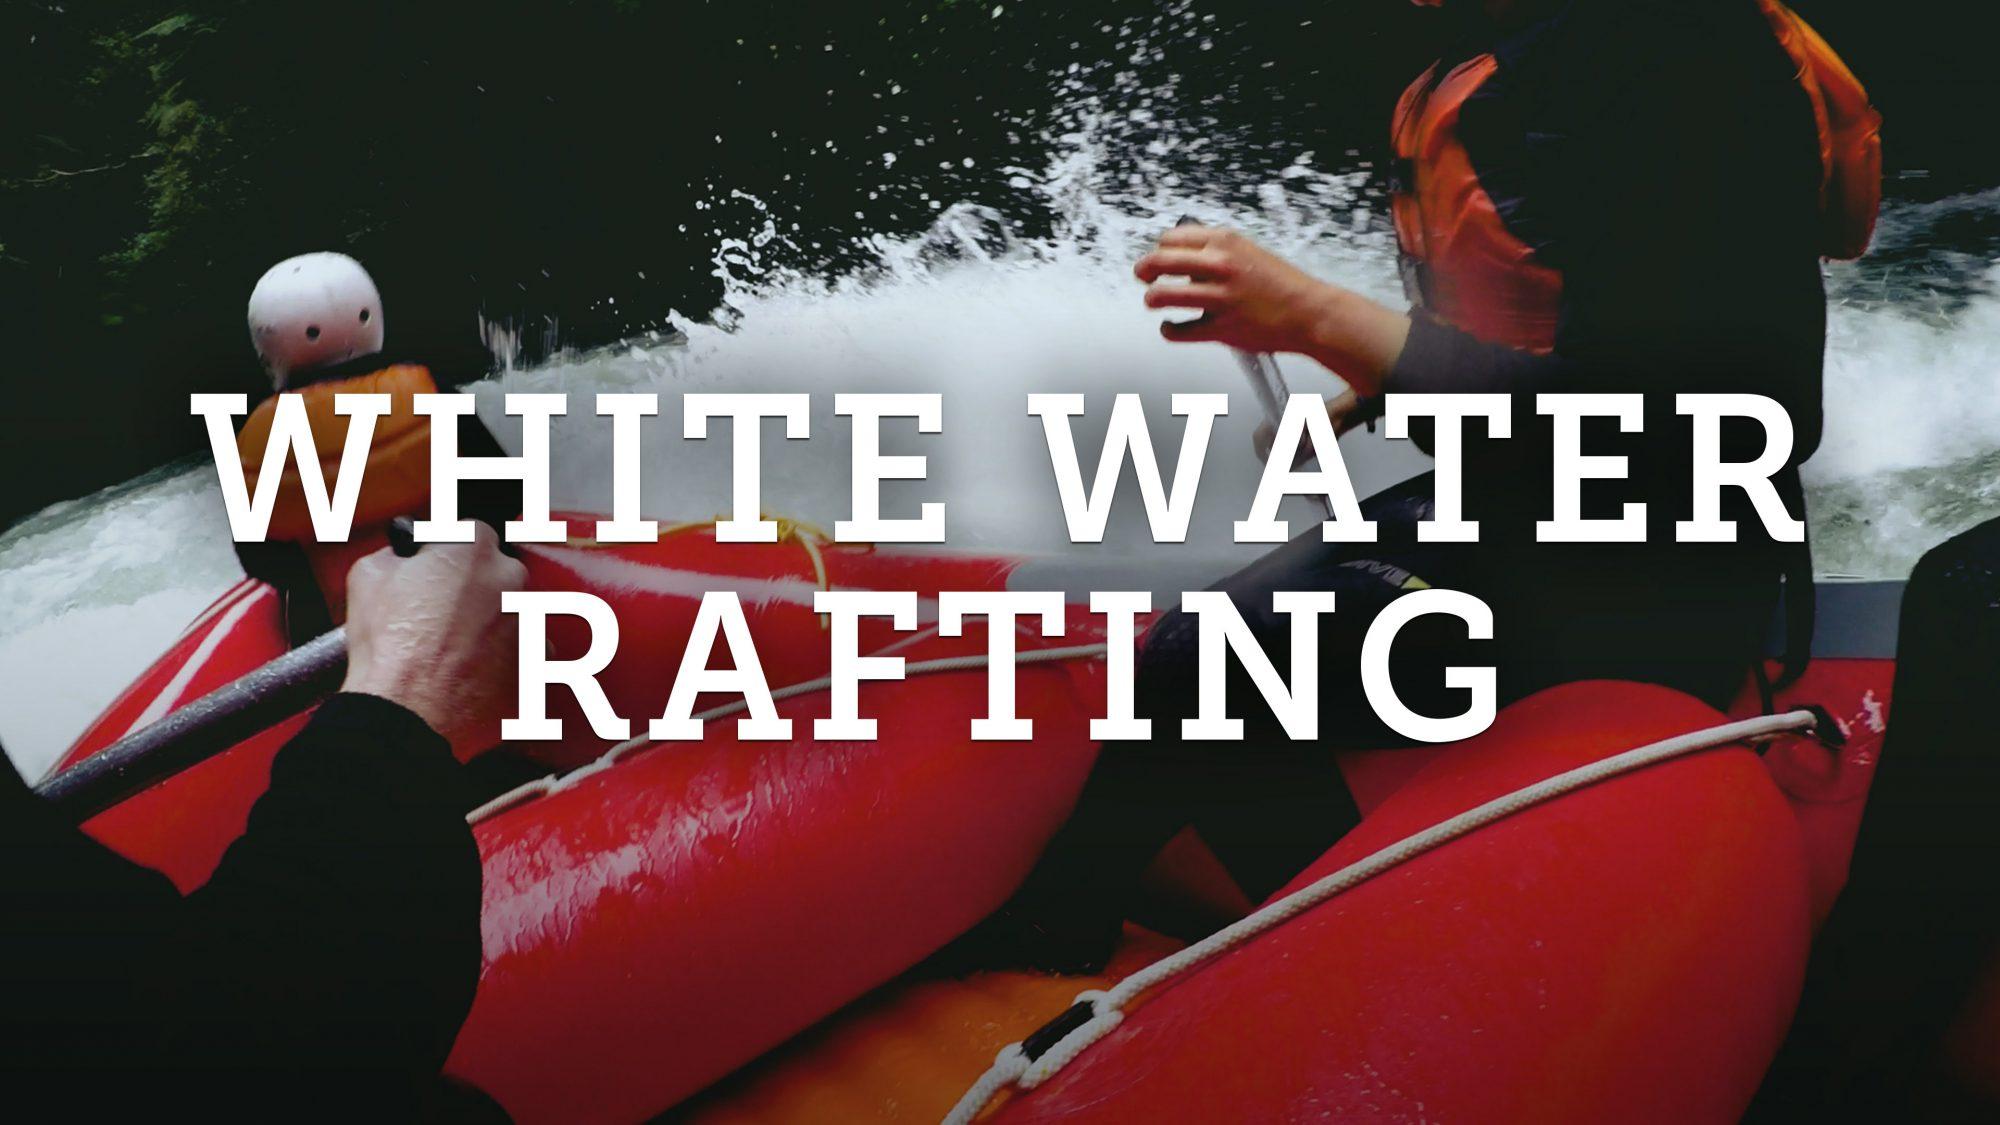 River Rats, Rotorua White Water Rafting in New Zealand